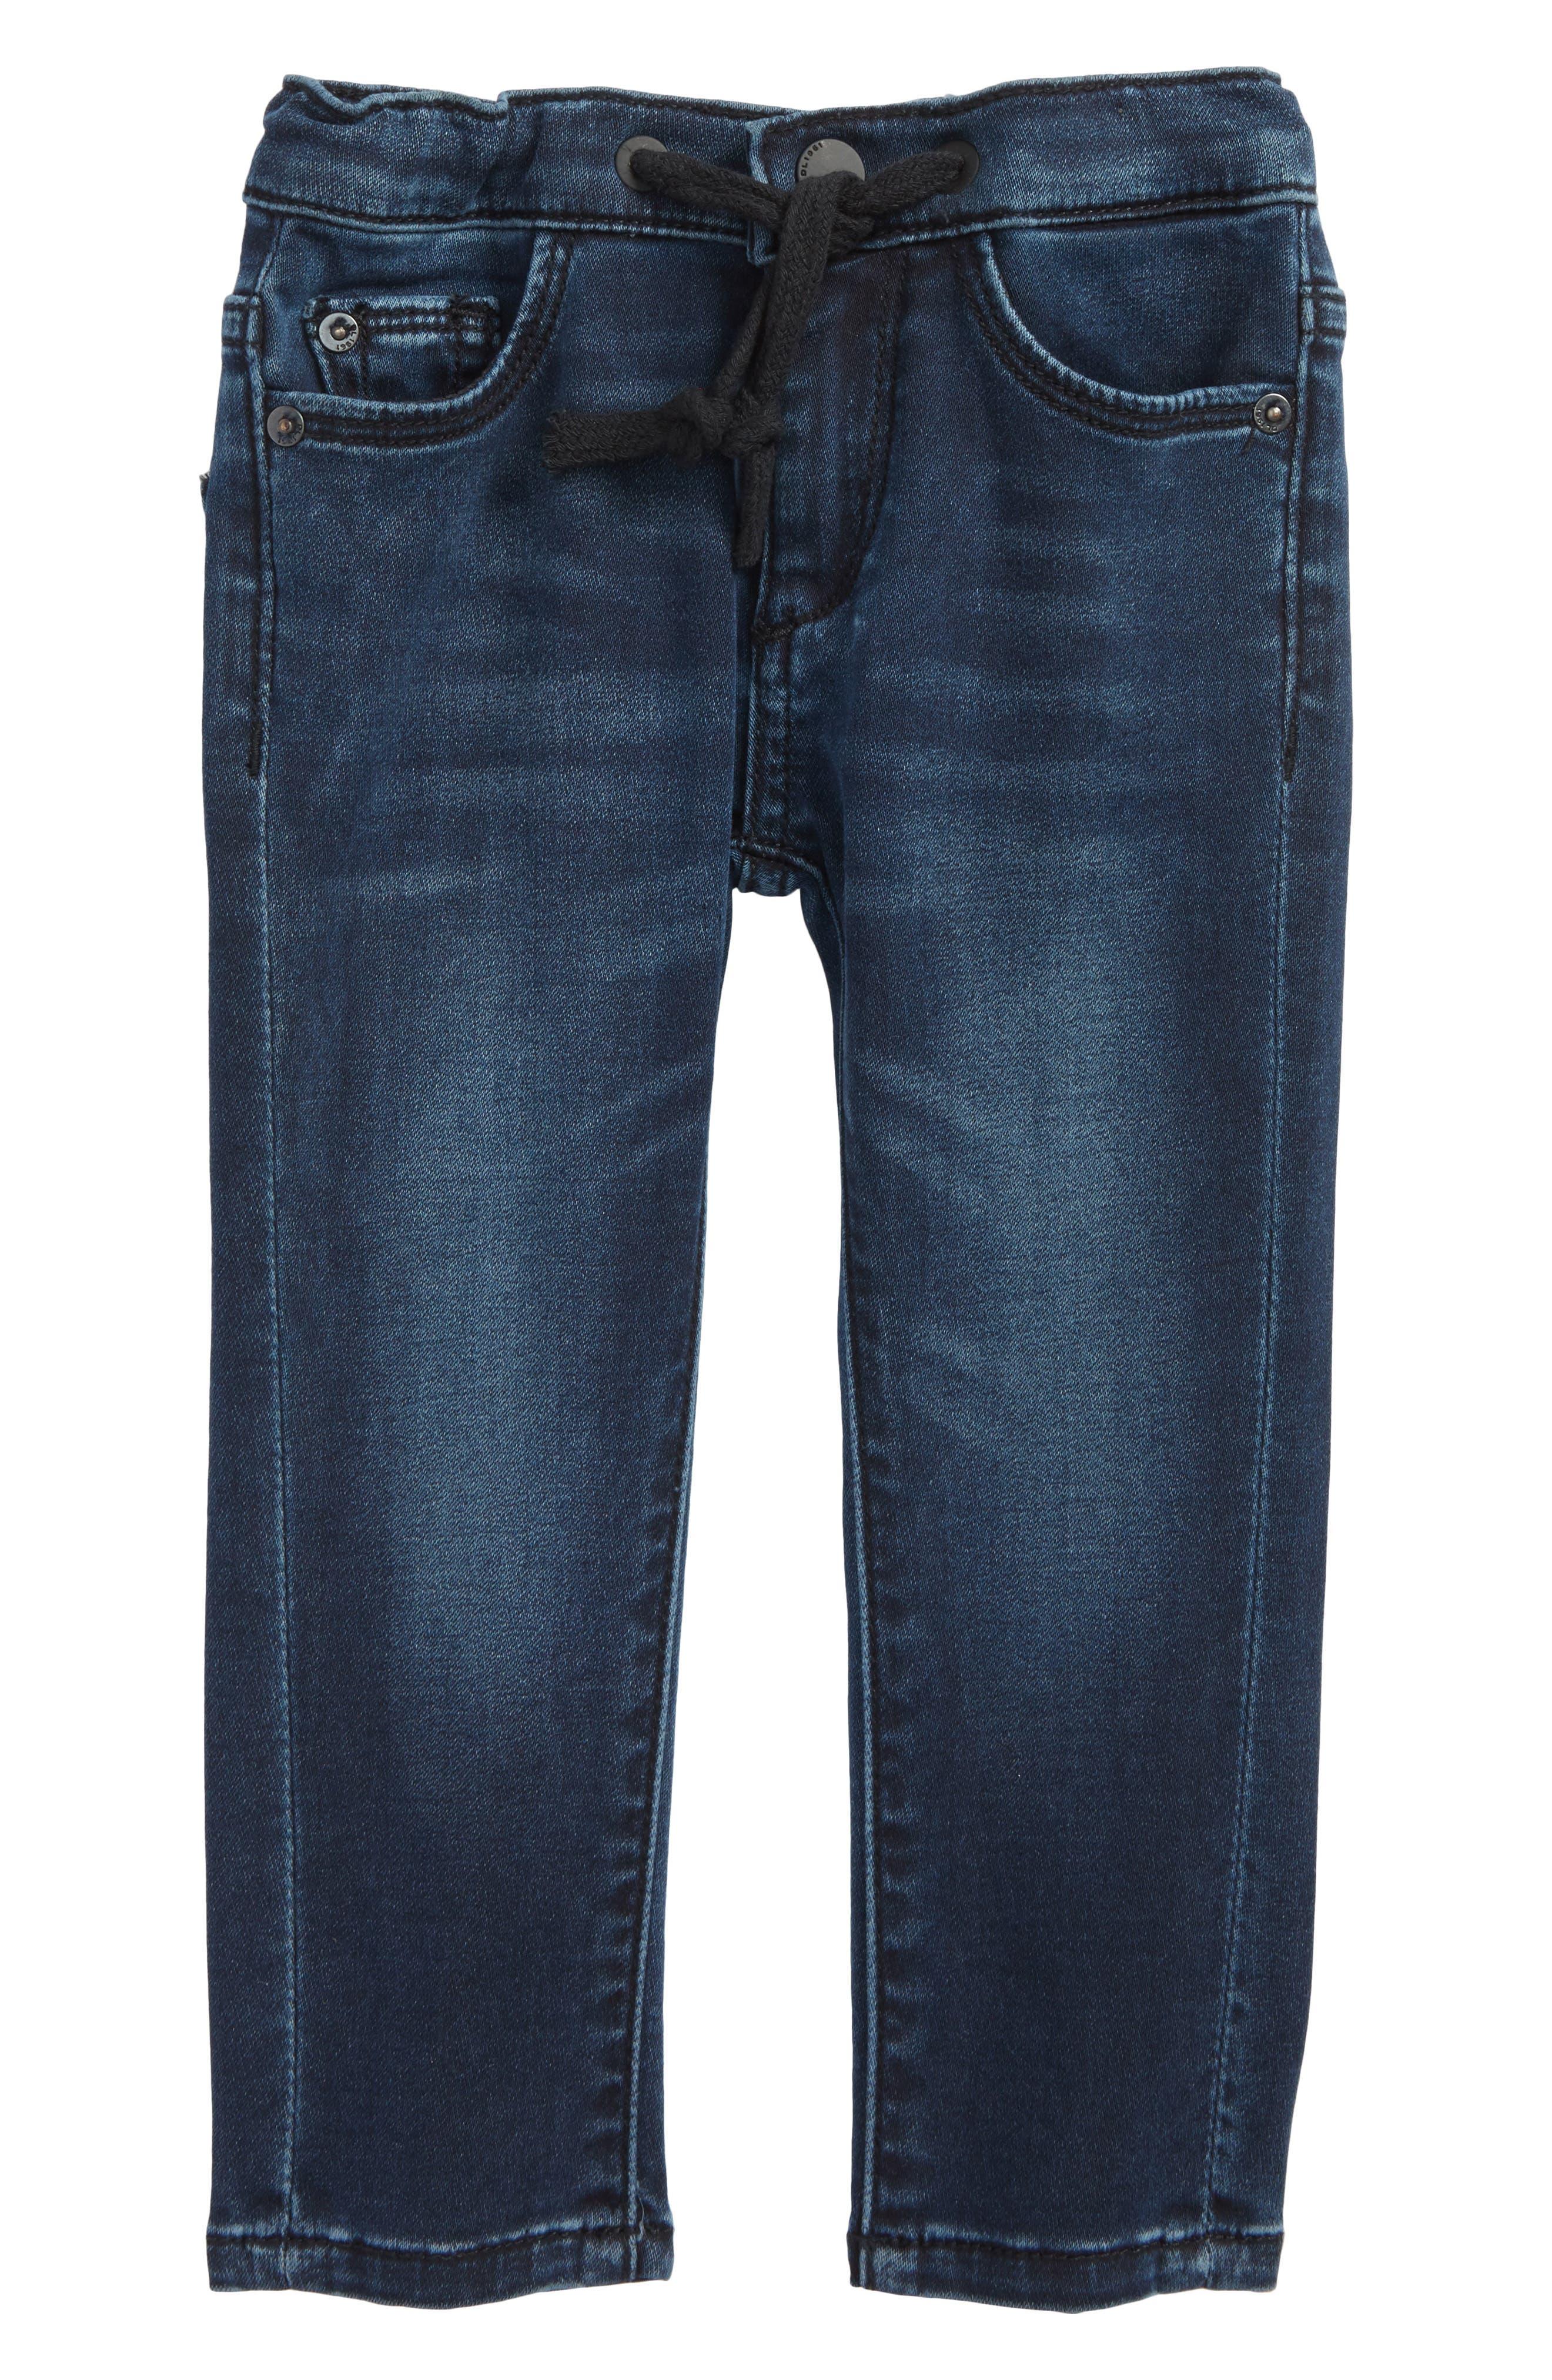 Eddy Slim Fit Jeans,                             Main thumbnail 1, color,                             Reserve